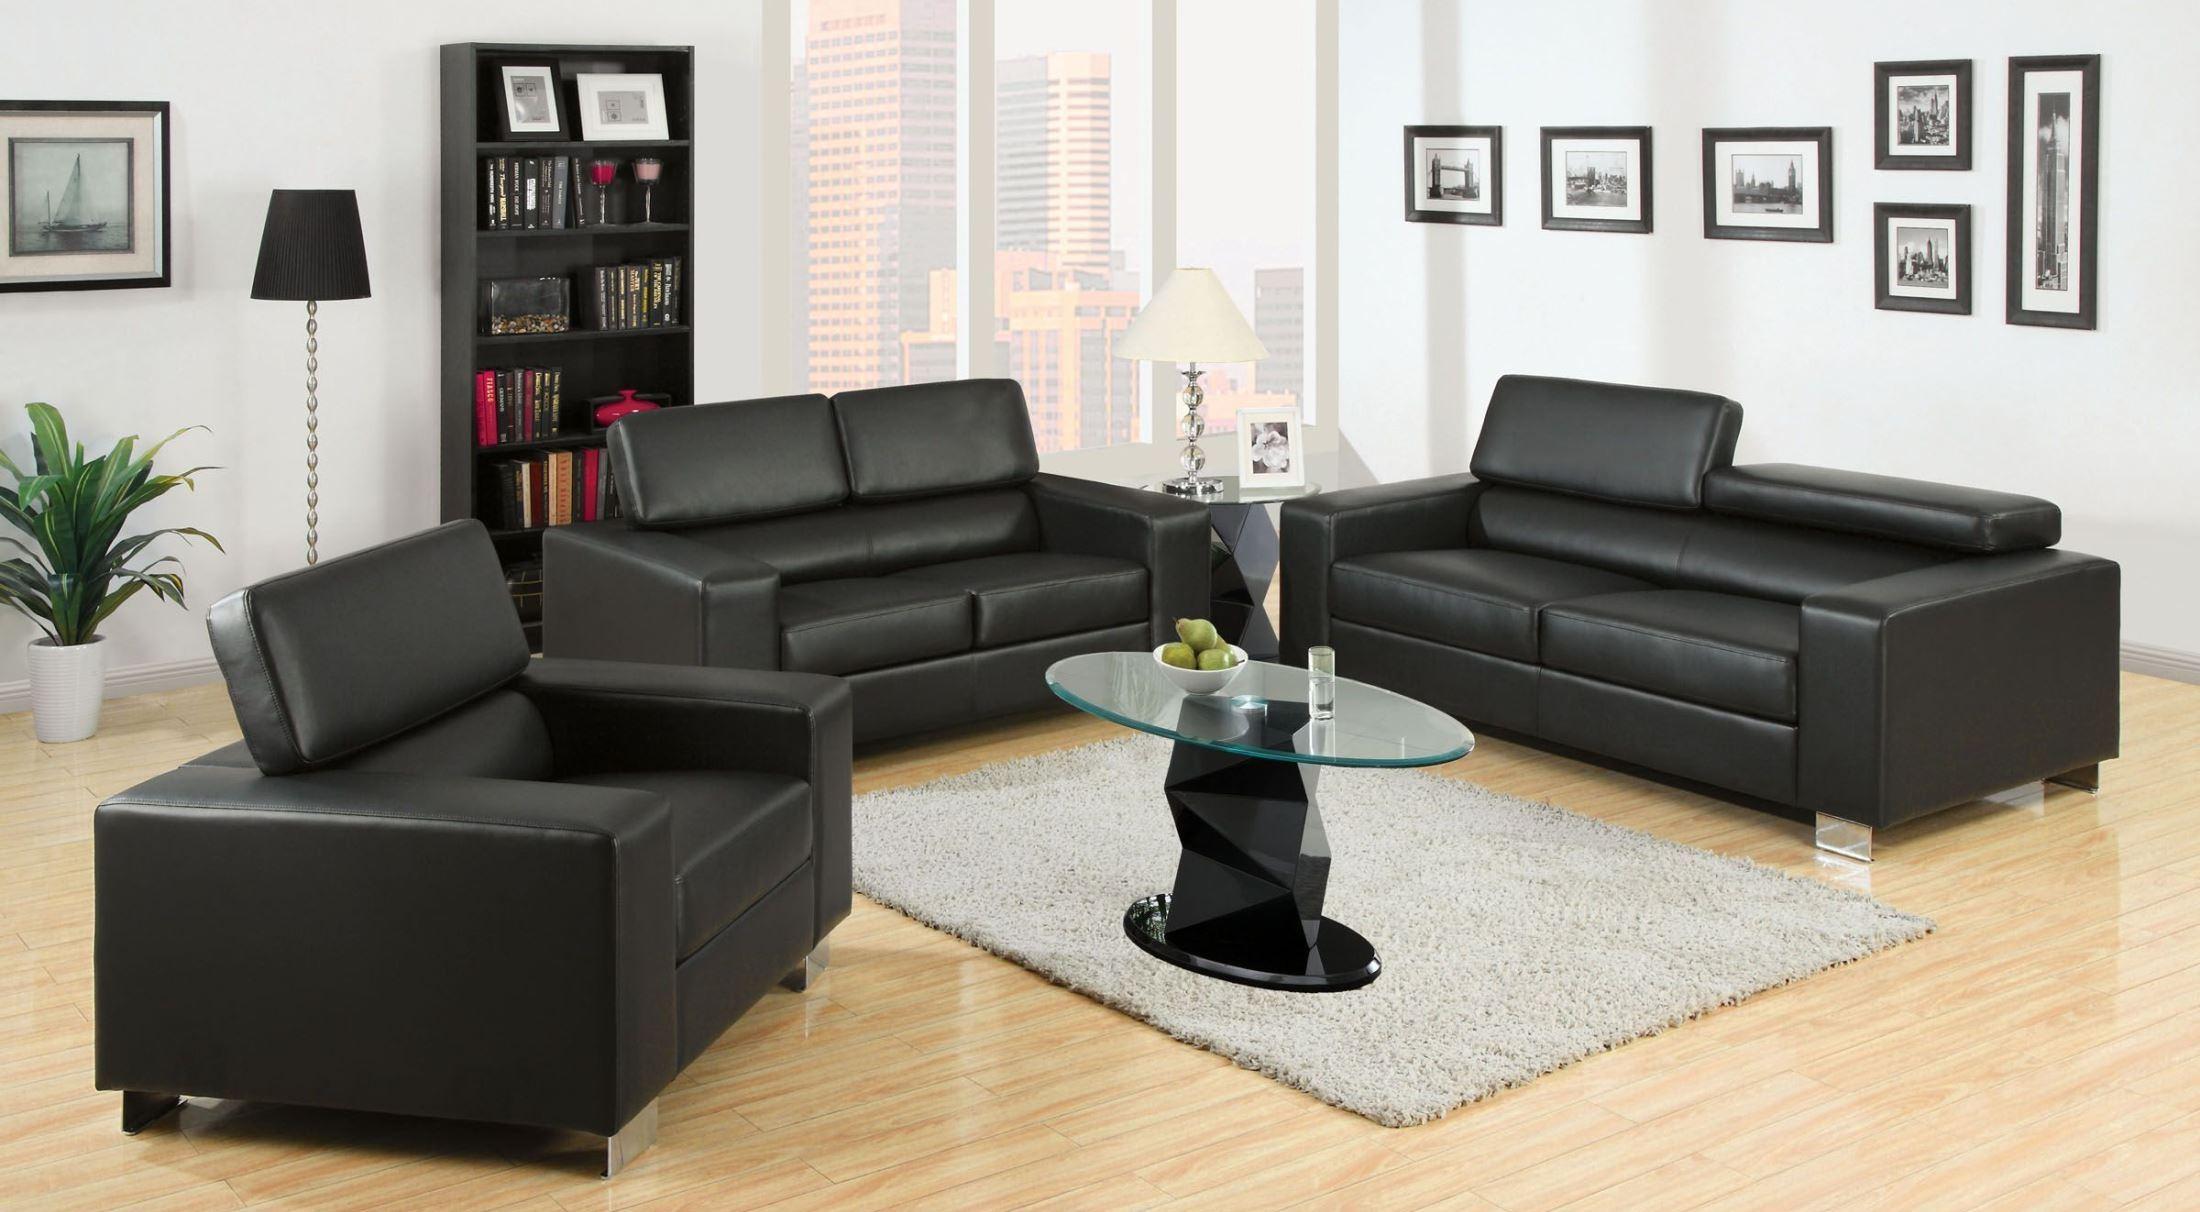 Makri black bonded leather match living room set from for Matching living room furniture